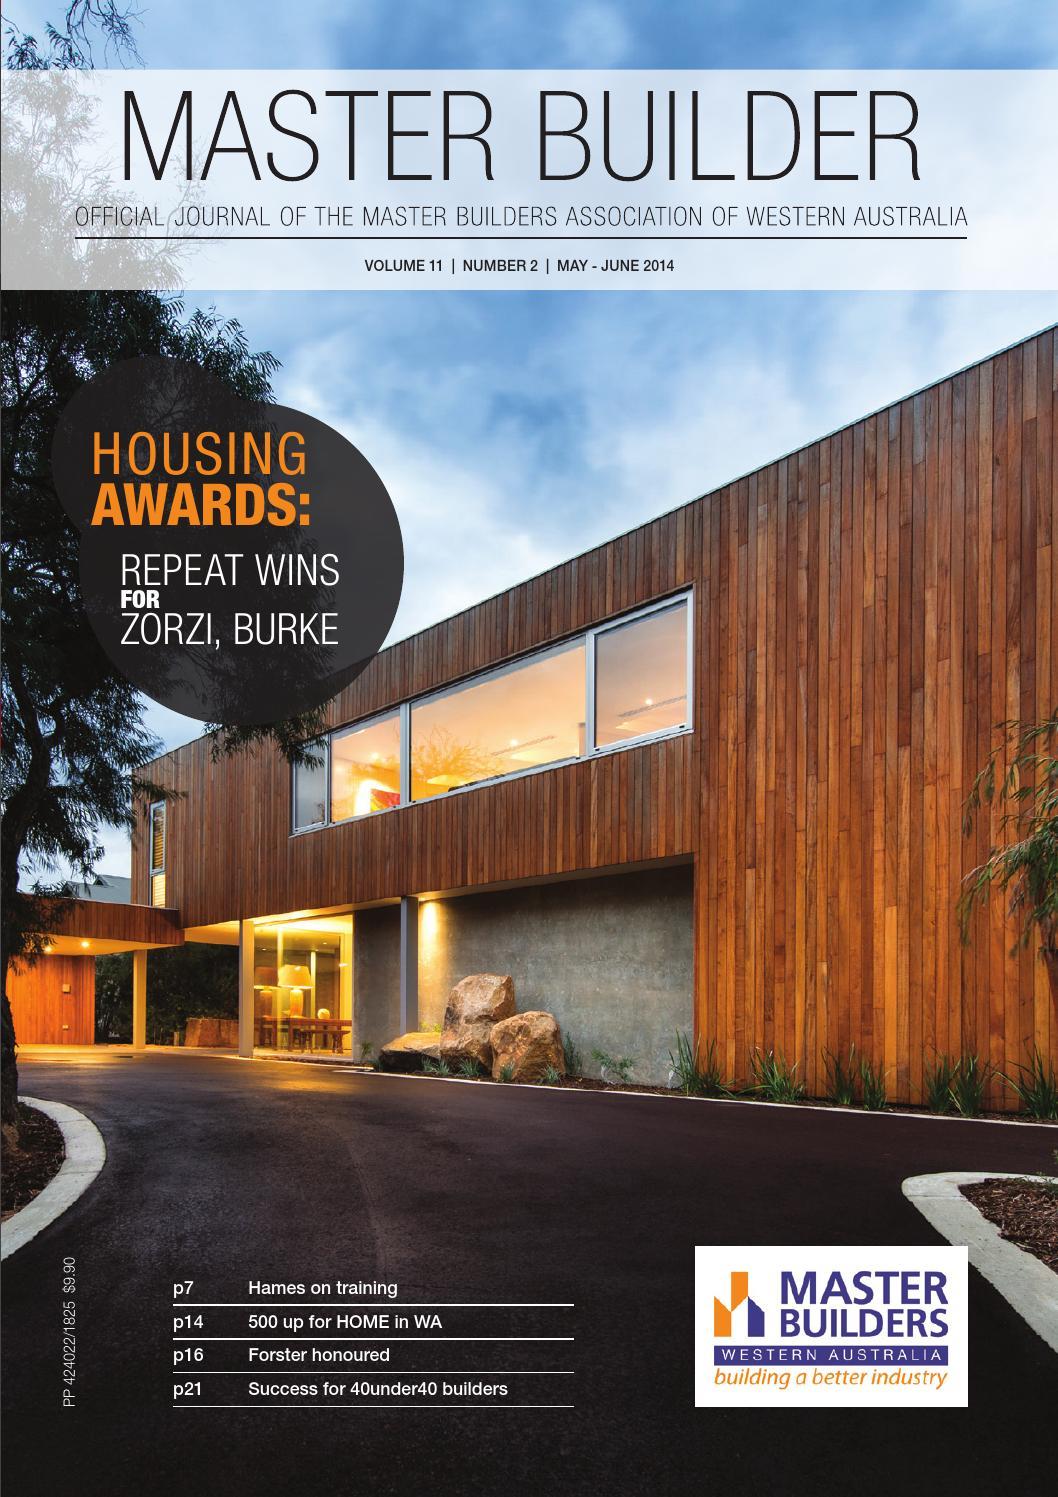 2014 Master Builders Western Australia Magazine May Jun By